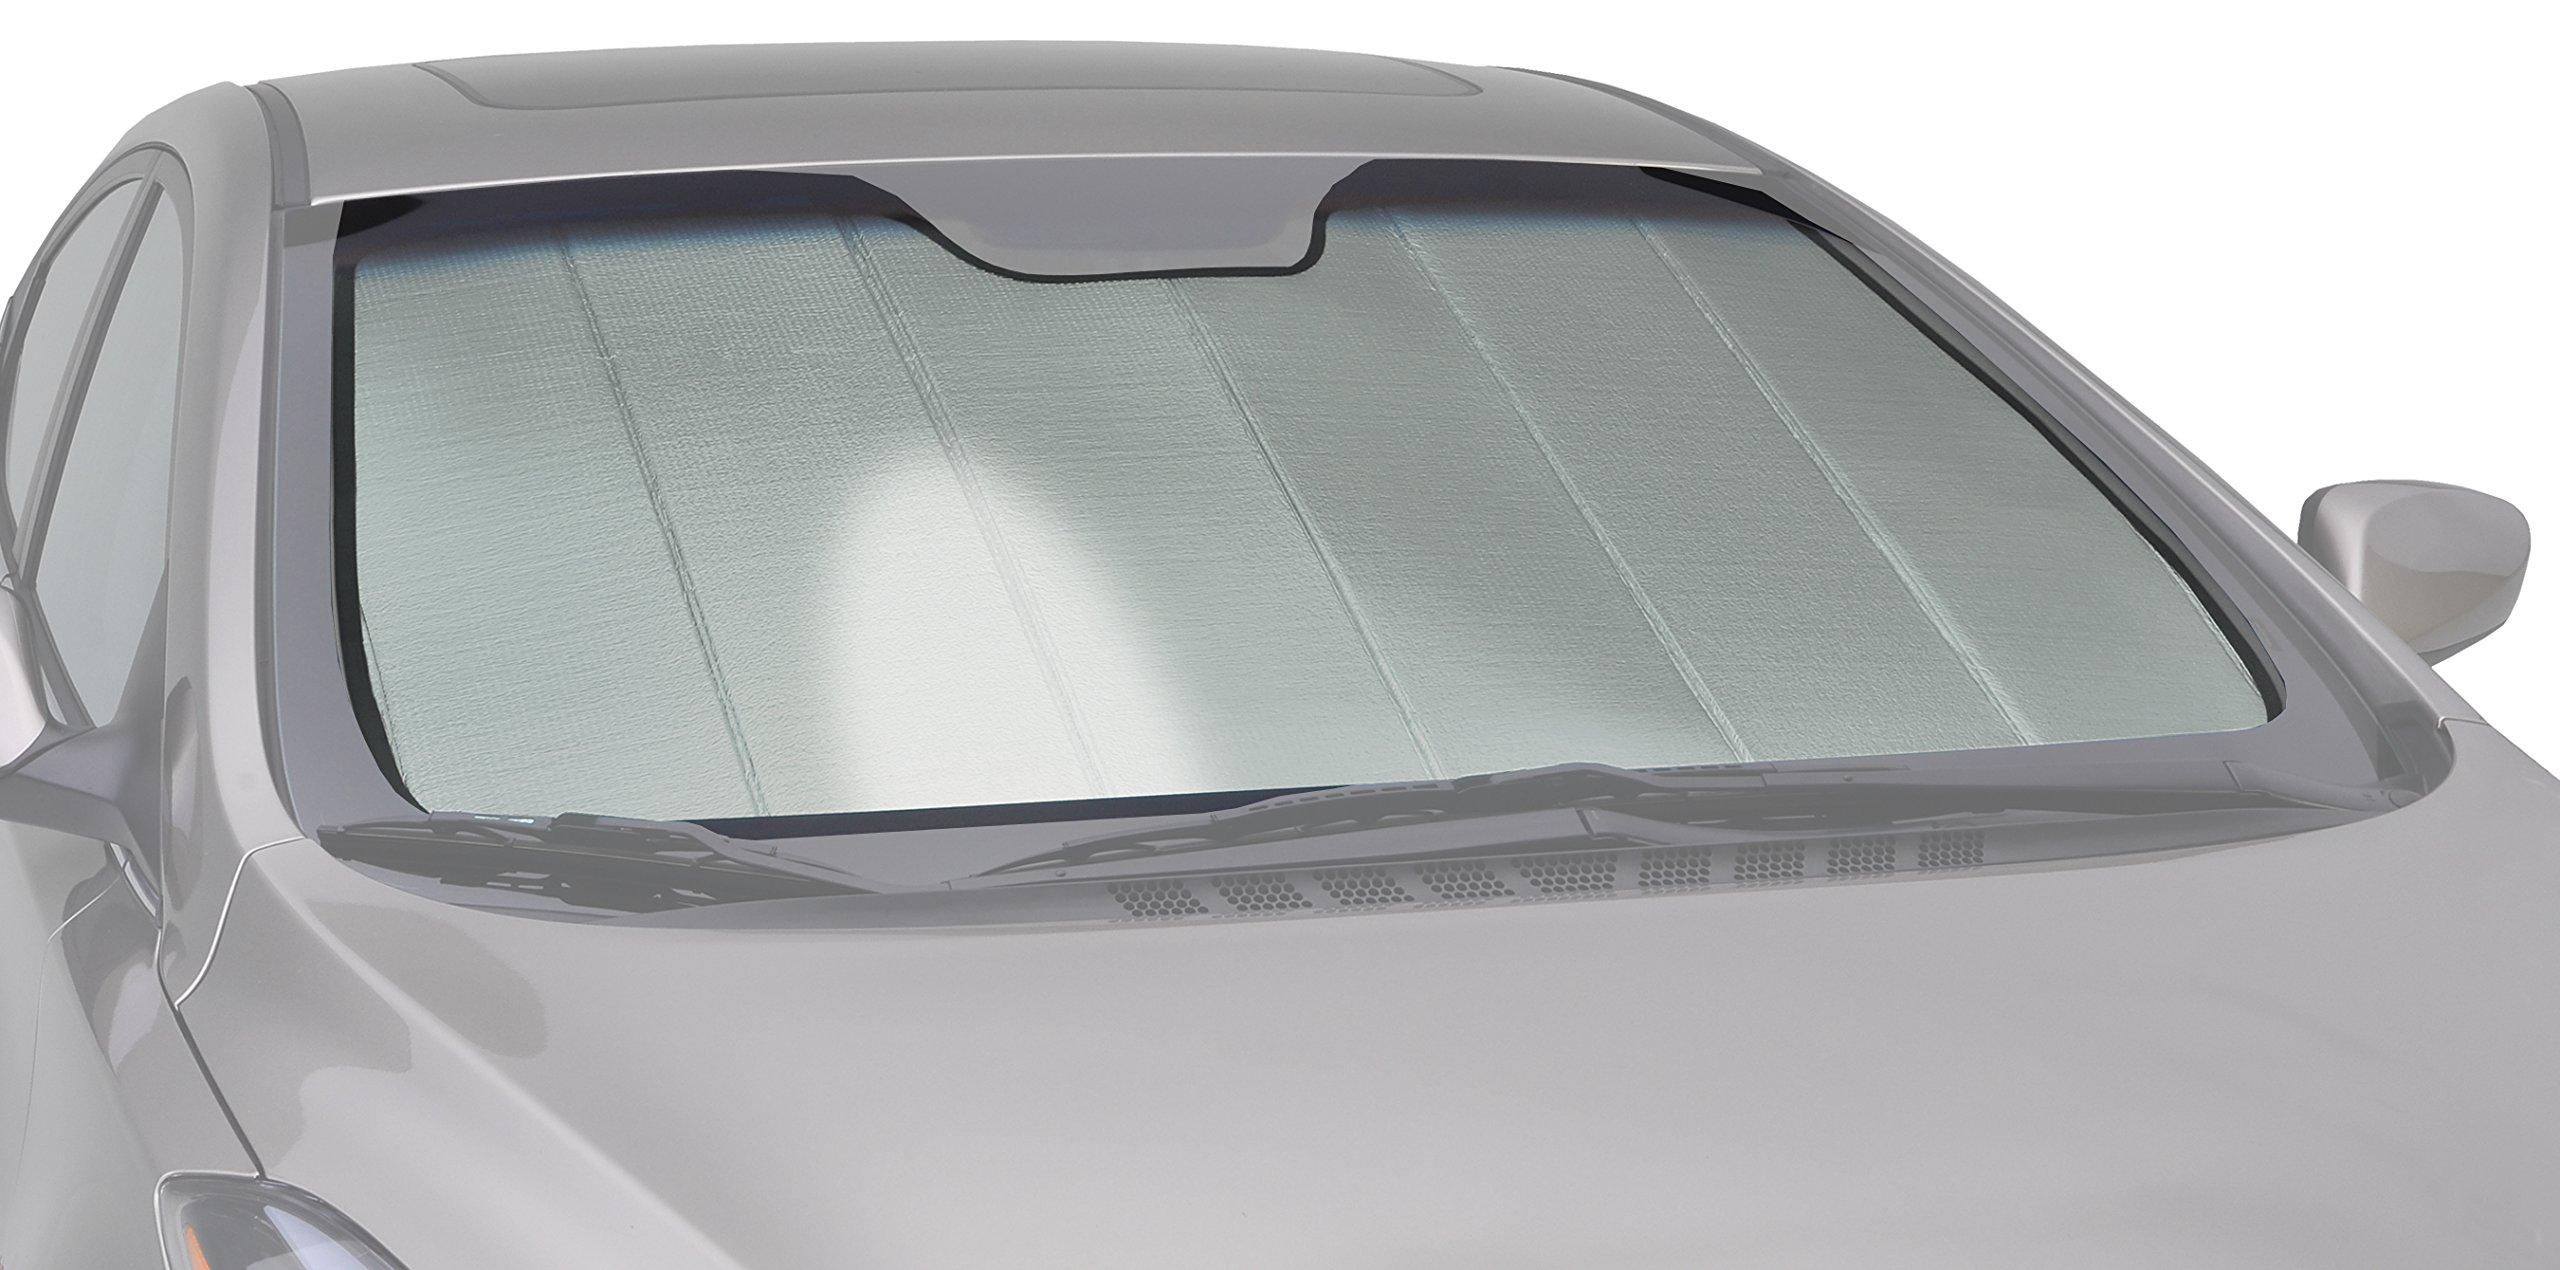 Intro-Tech LX-37-P Silver Custom Fit Premium Folding Windshield Sunshade for Select Lexus ES350/300H Models